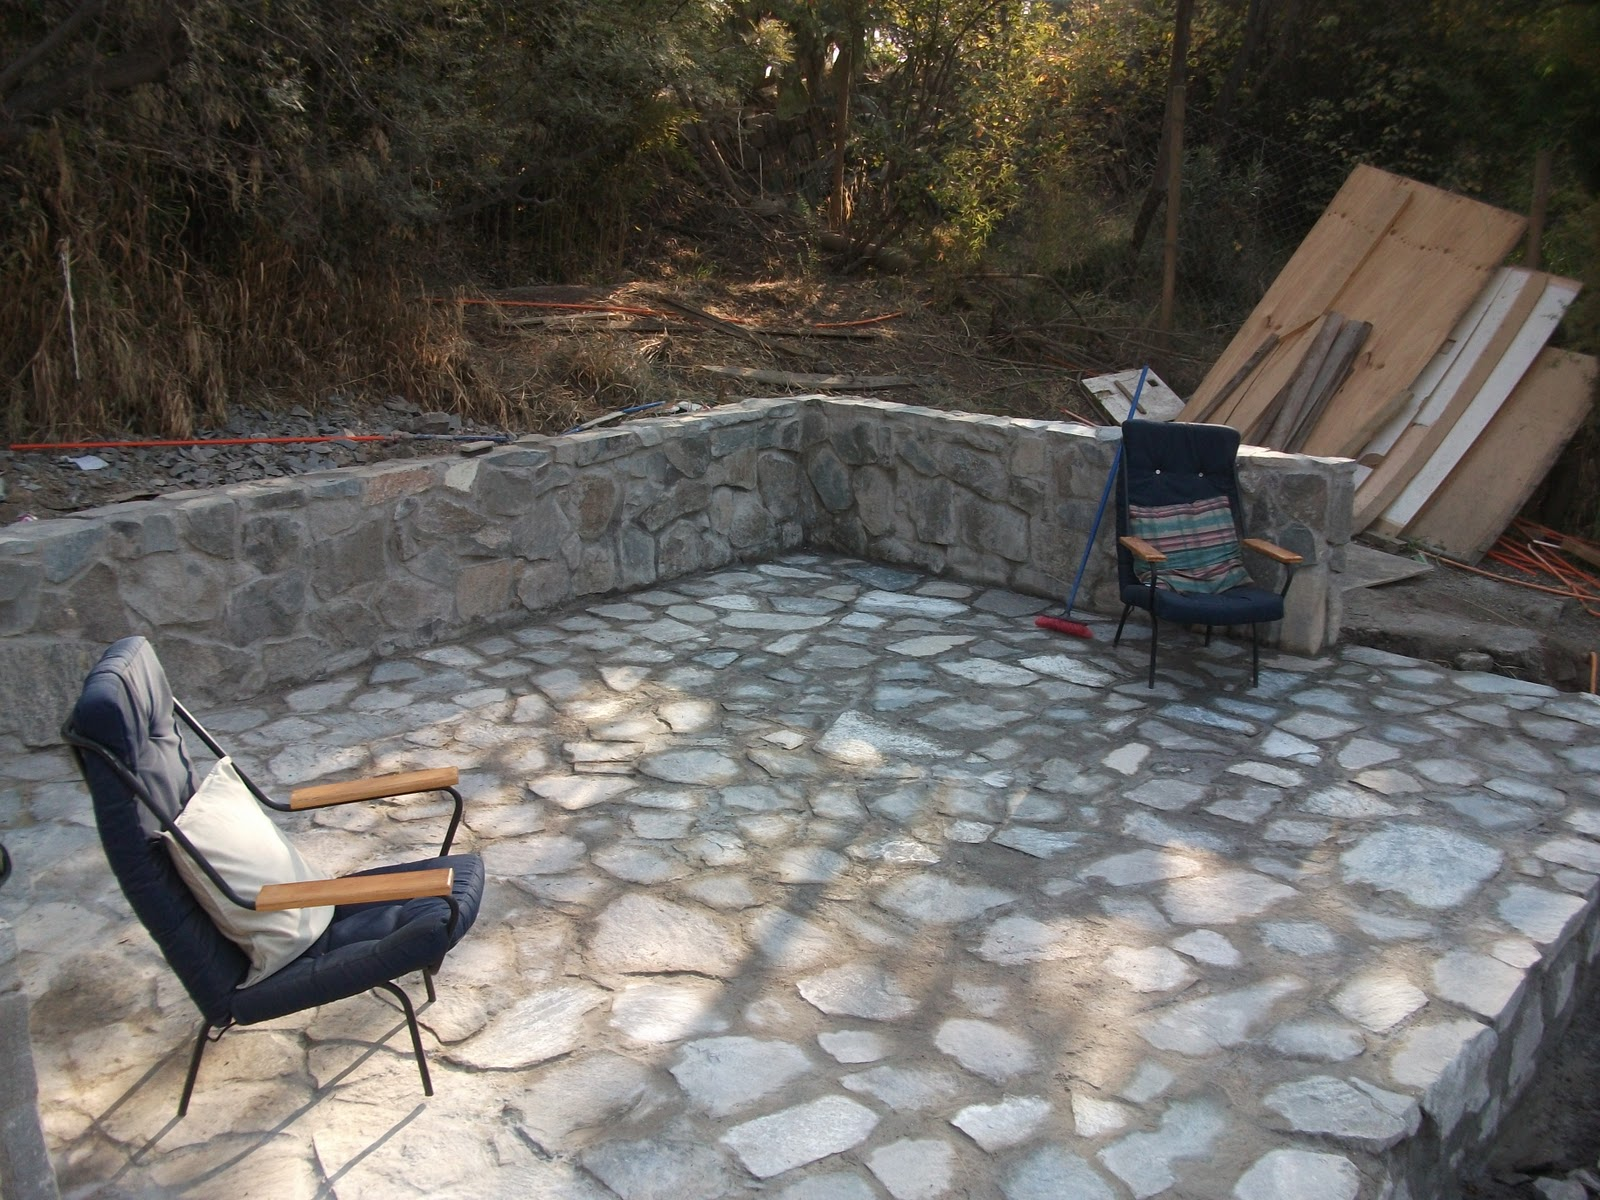 Pisos de piedra imagui for Pisos de piedra para terrazas